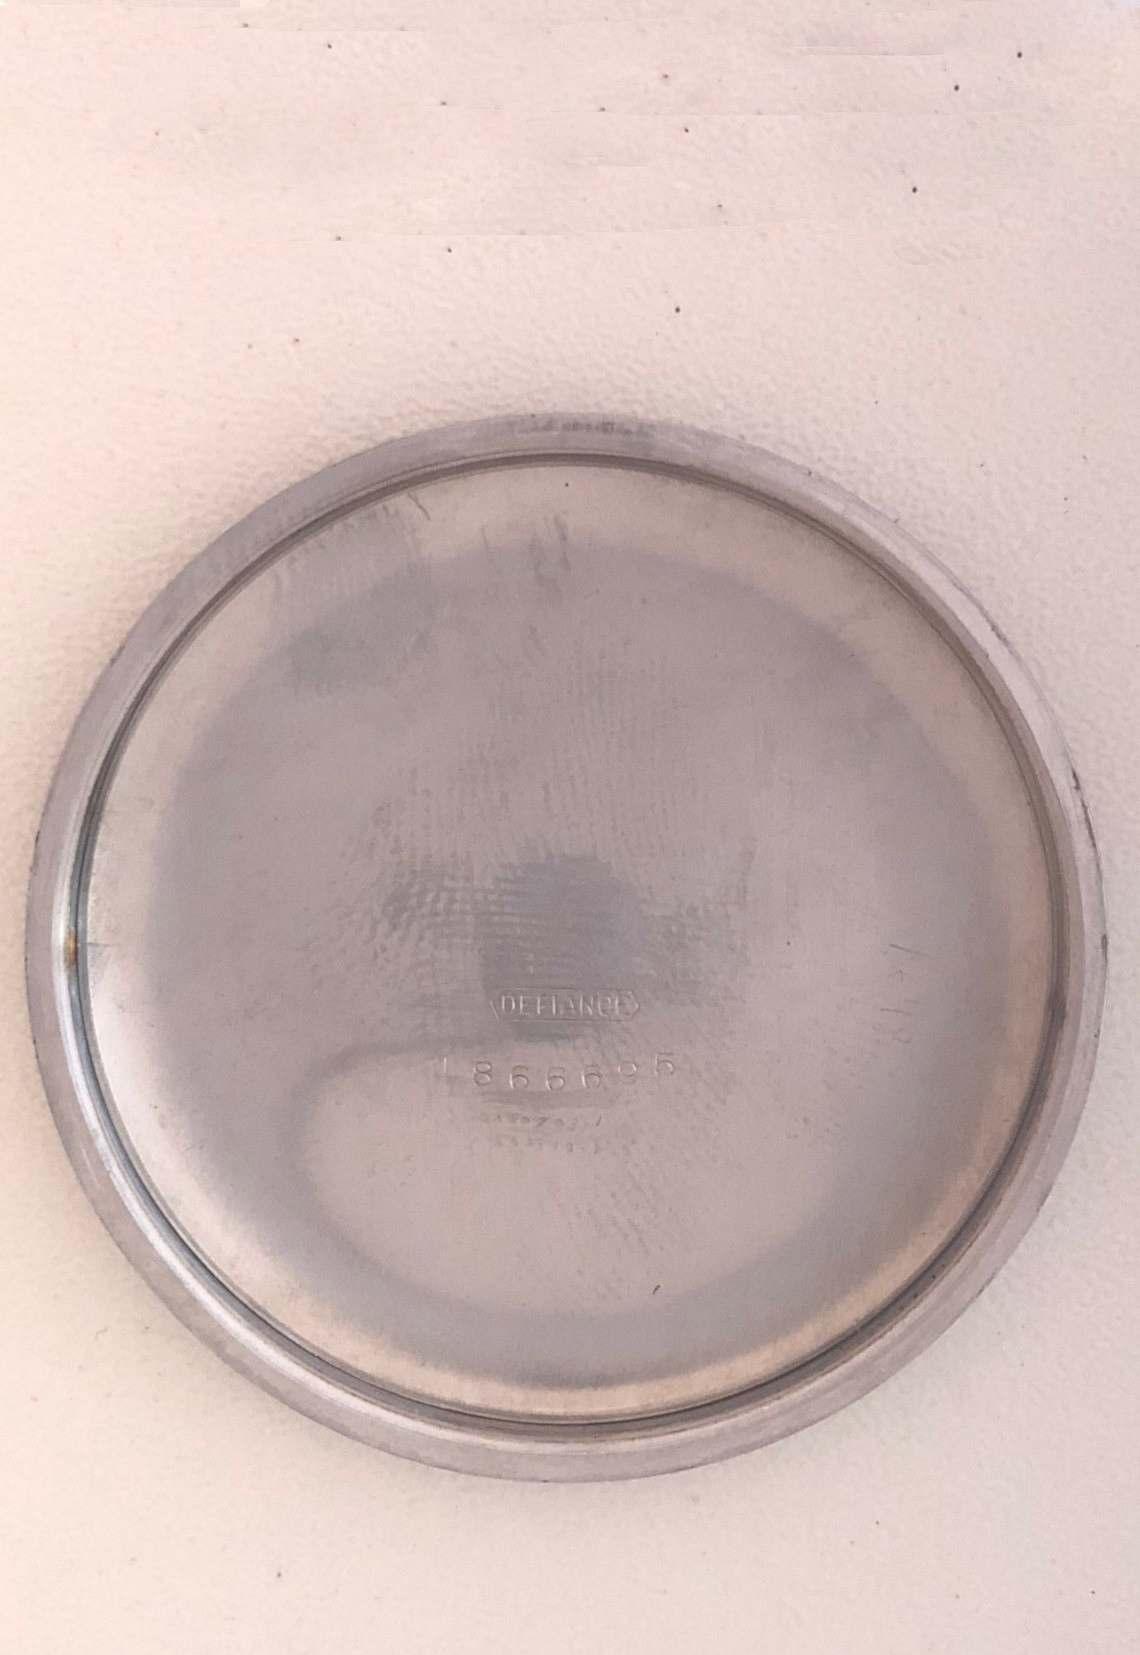 b1eb622df Reloj lepine de la firma americana ILLINOIS WATCH Co. con esfera en ...